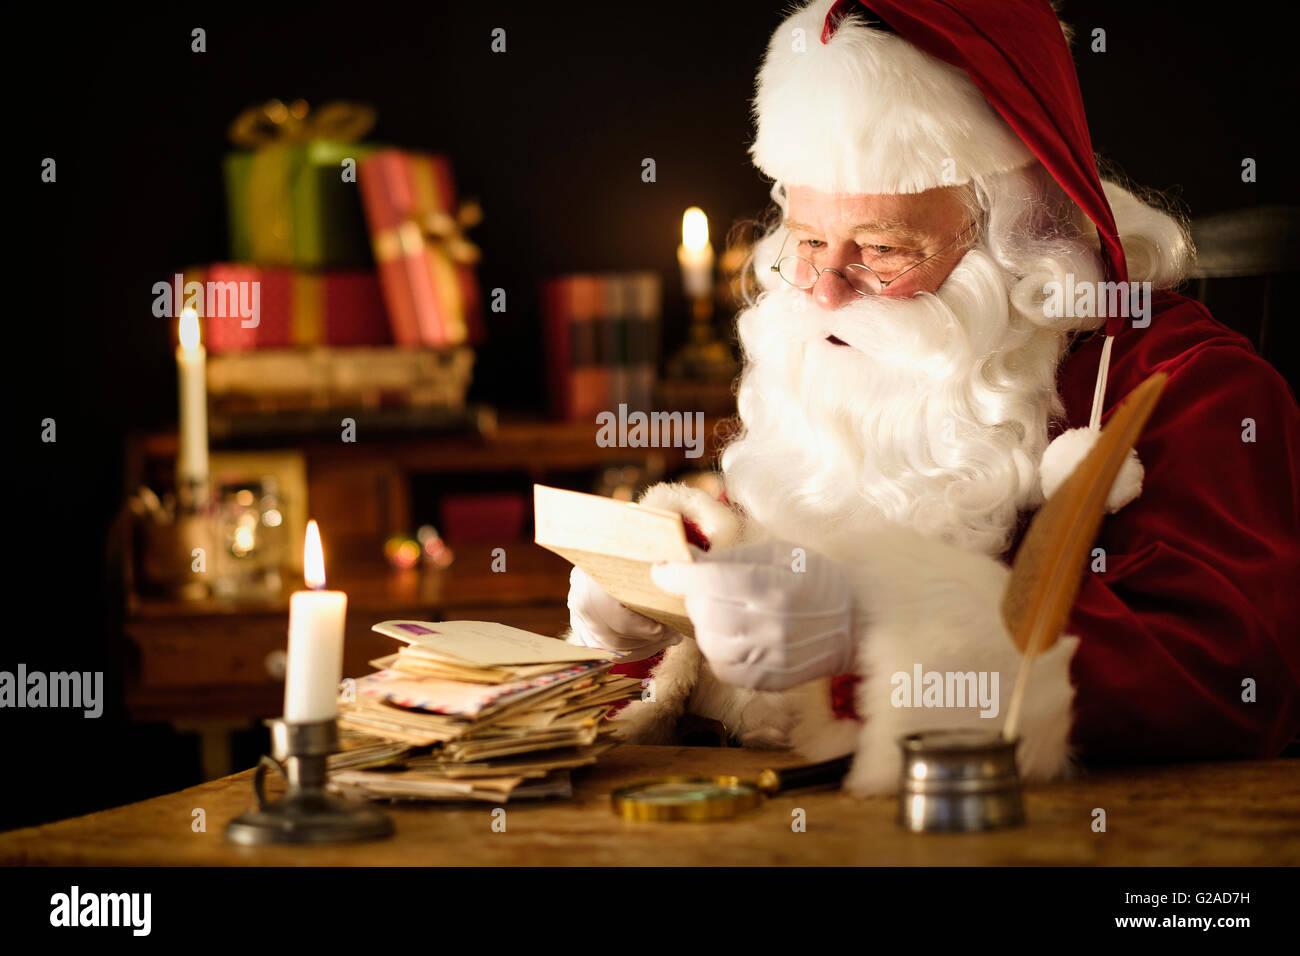 Portrait of Santa Claus reading child's letter at desk - Stock Image